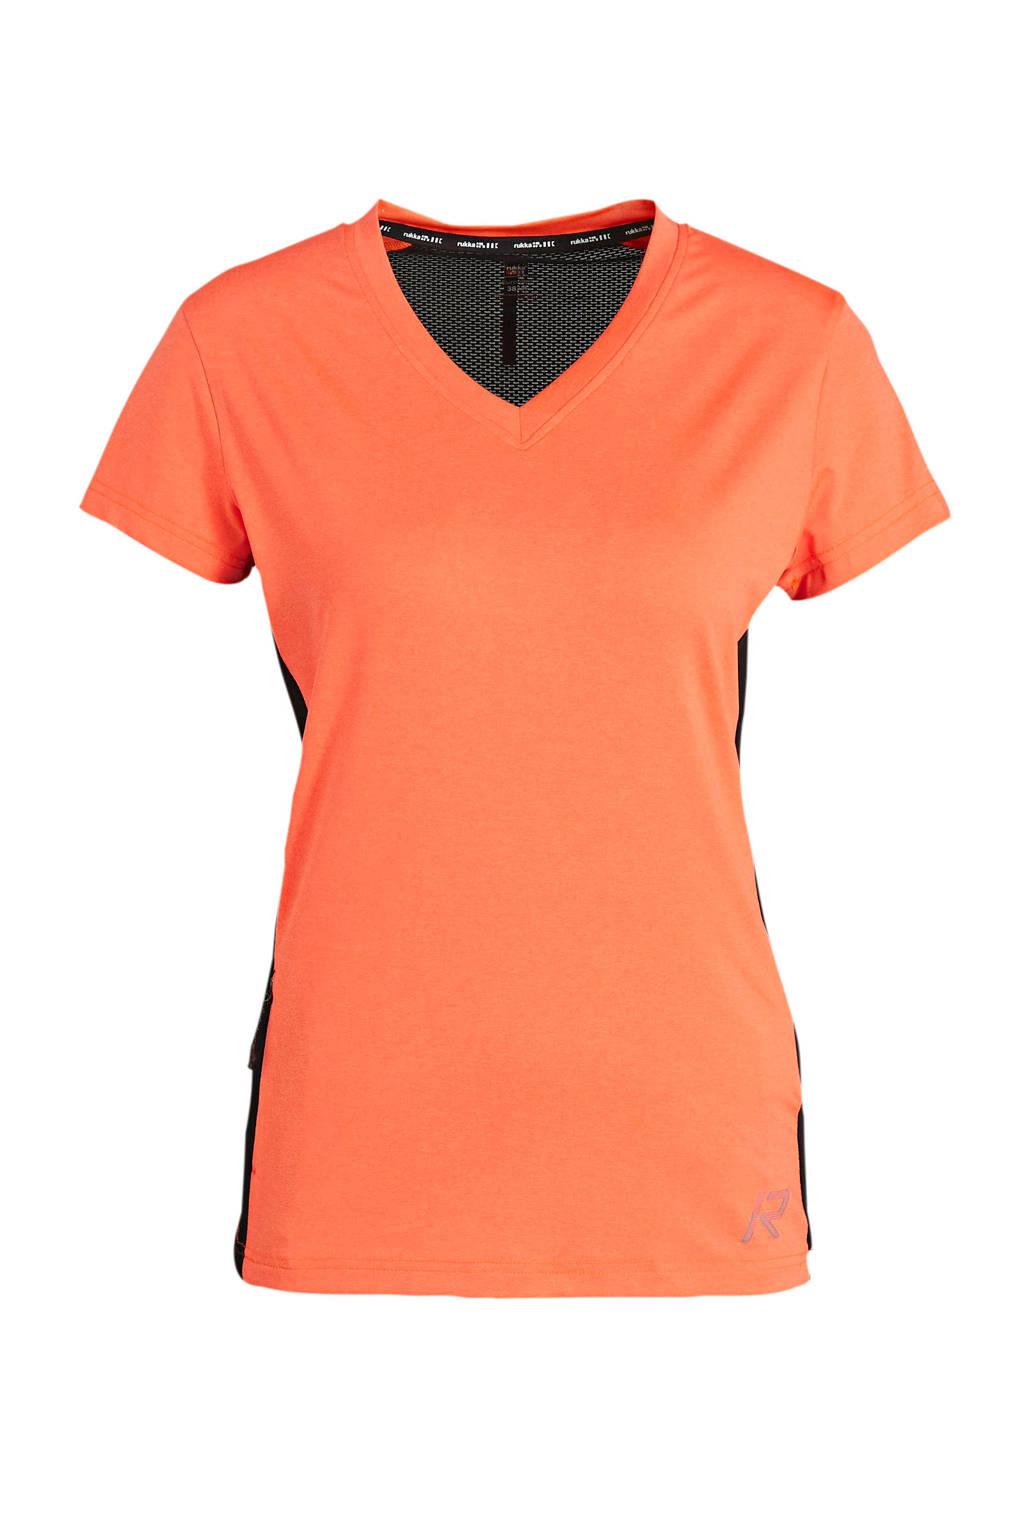 Rukka sport T-shirt Maanovilja oranje/zwart, Oranje/zwart